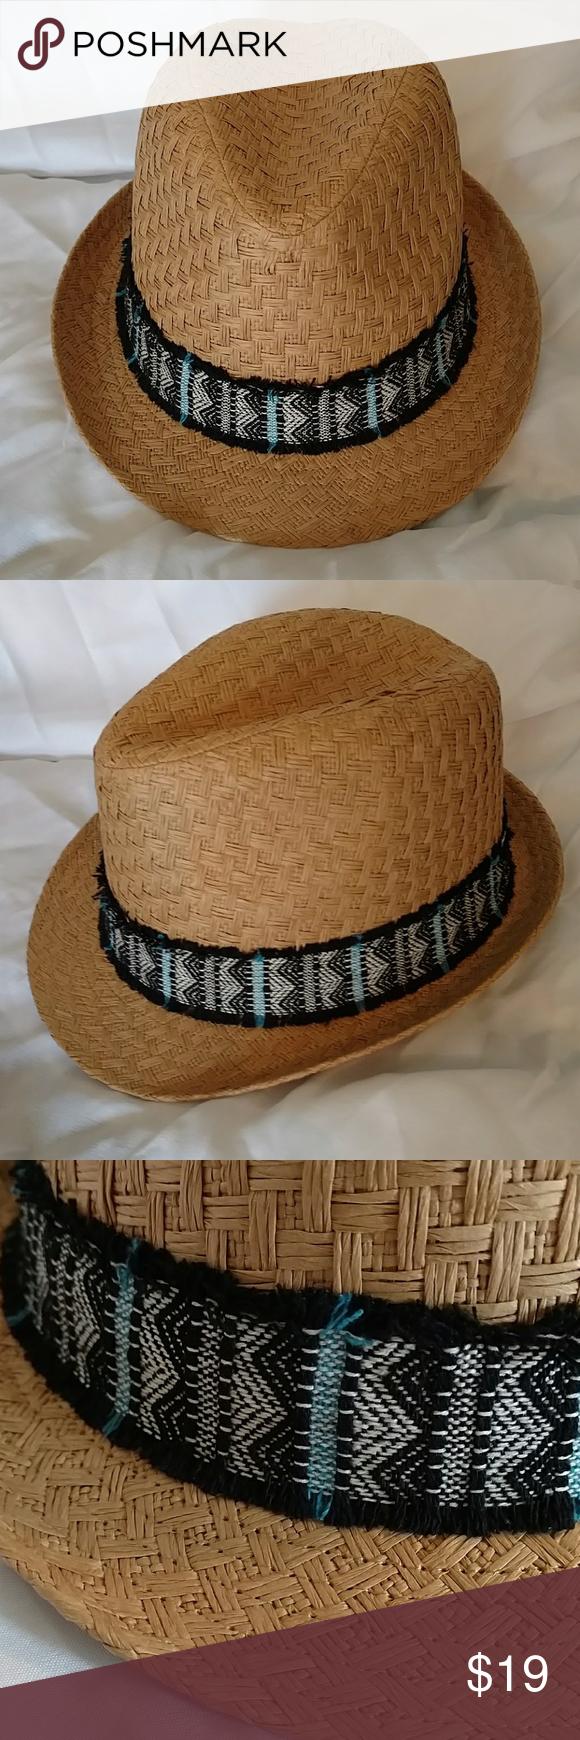 b7756d2ed1037 🆕💙Boho Aztec Band Straw Fedora NWOT BOHO Aztec Print Wide Band Straw  Fedora. Dark Natural Woven Straw. NWOT! ONE SIZE Accessories Hats